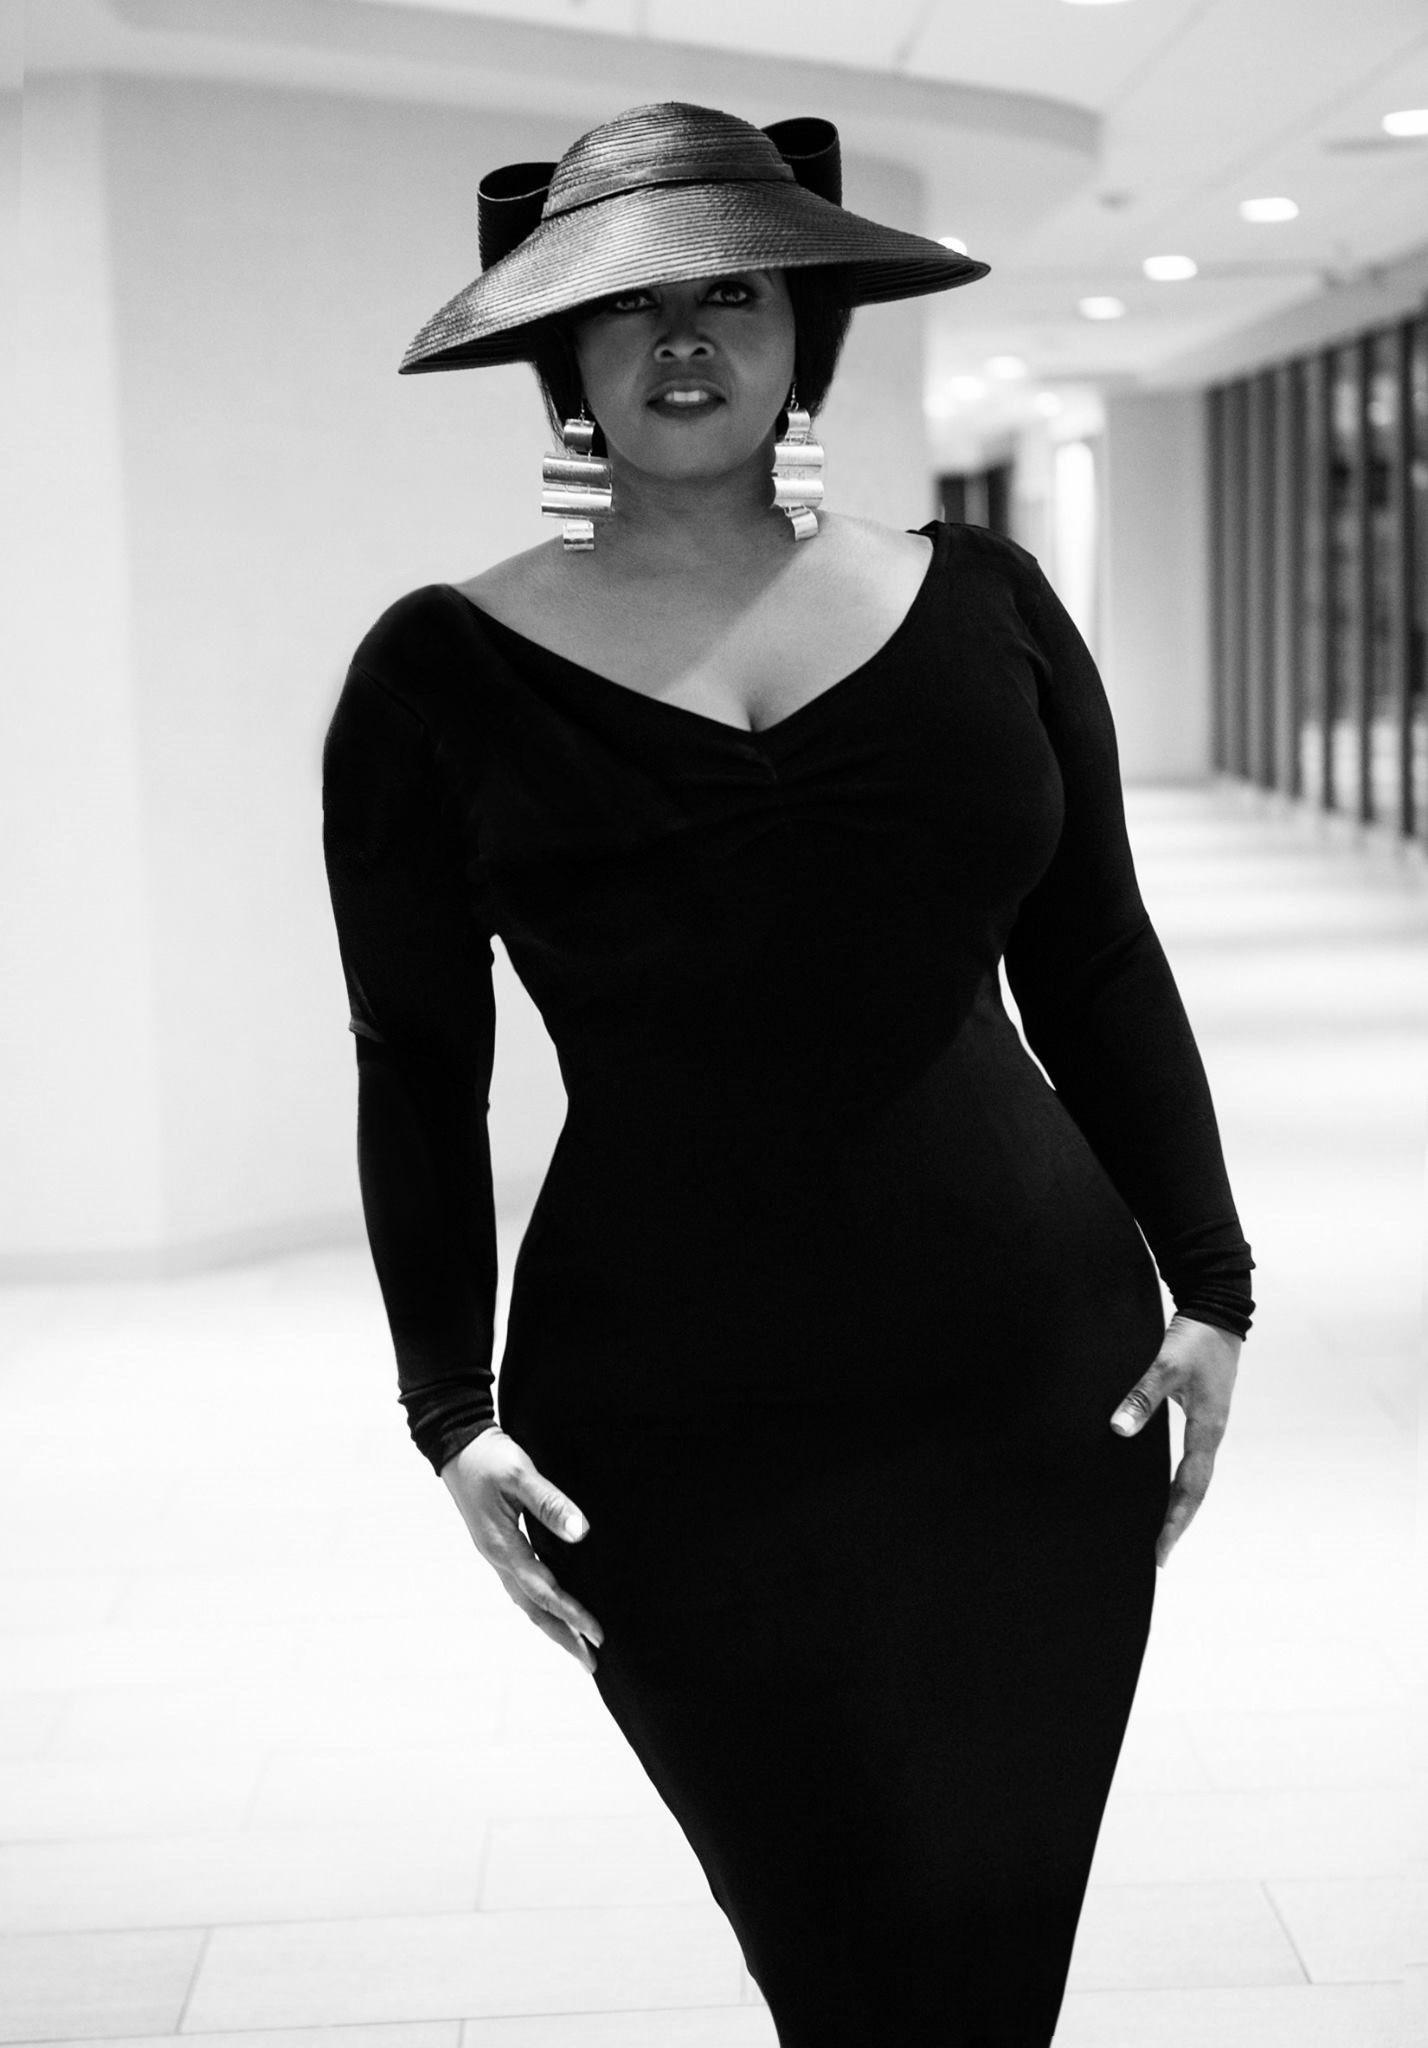 fb7cf0212f1 Plus size fashion for women..The little black plus size dress..curvy sexy  plus size.. fashionphotography  plussize  blackdress Designer Stylist  Patricia ...